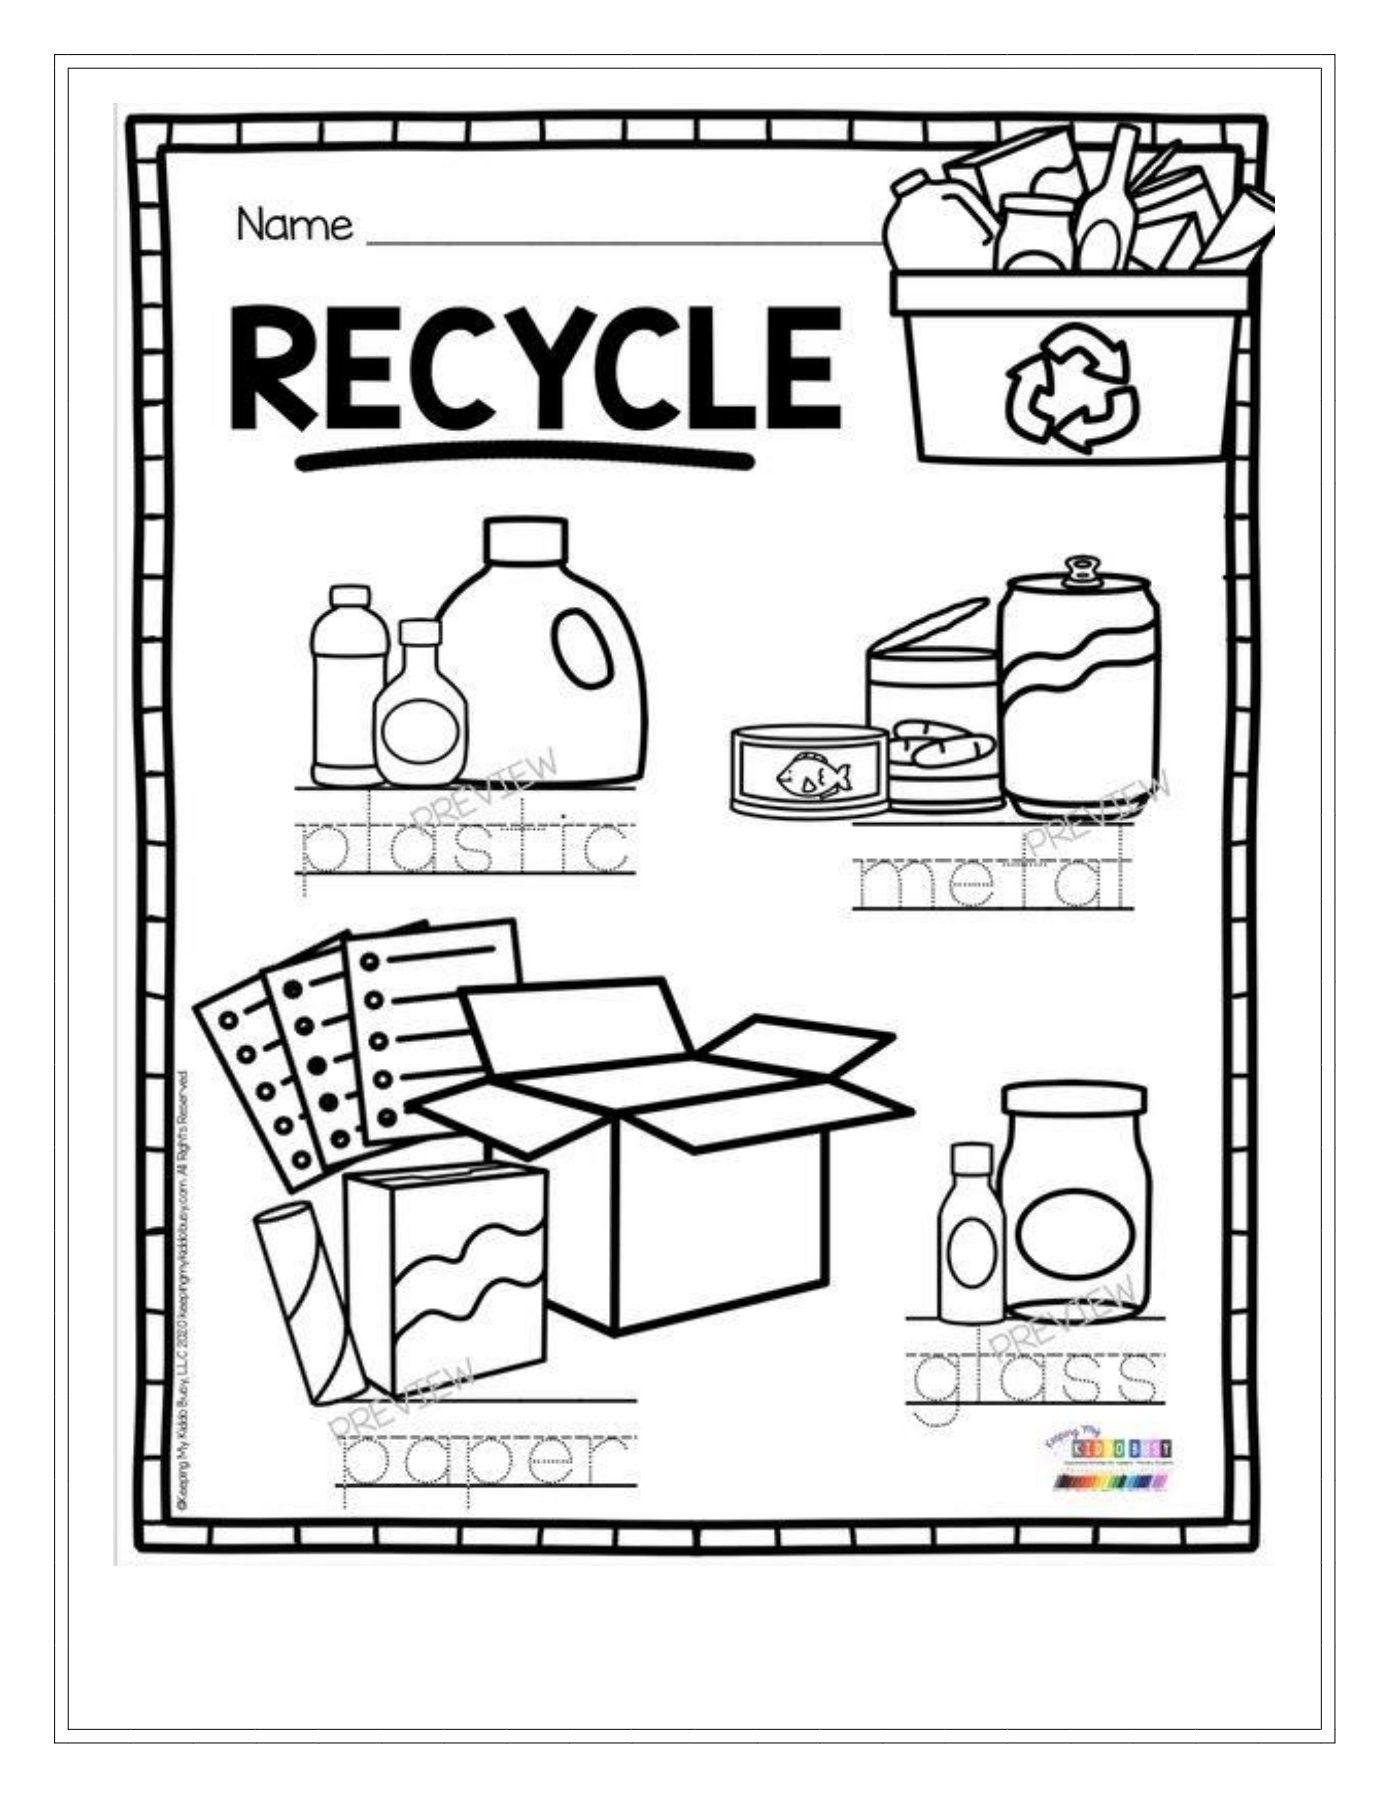 Grade 1 Science worksheet \materials\   Science worksheets [ 1797 x 1389 Pixel ]